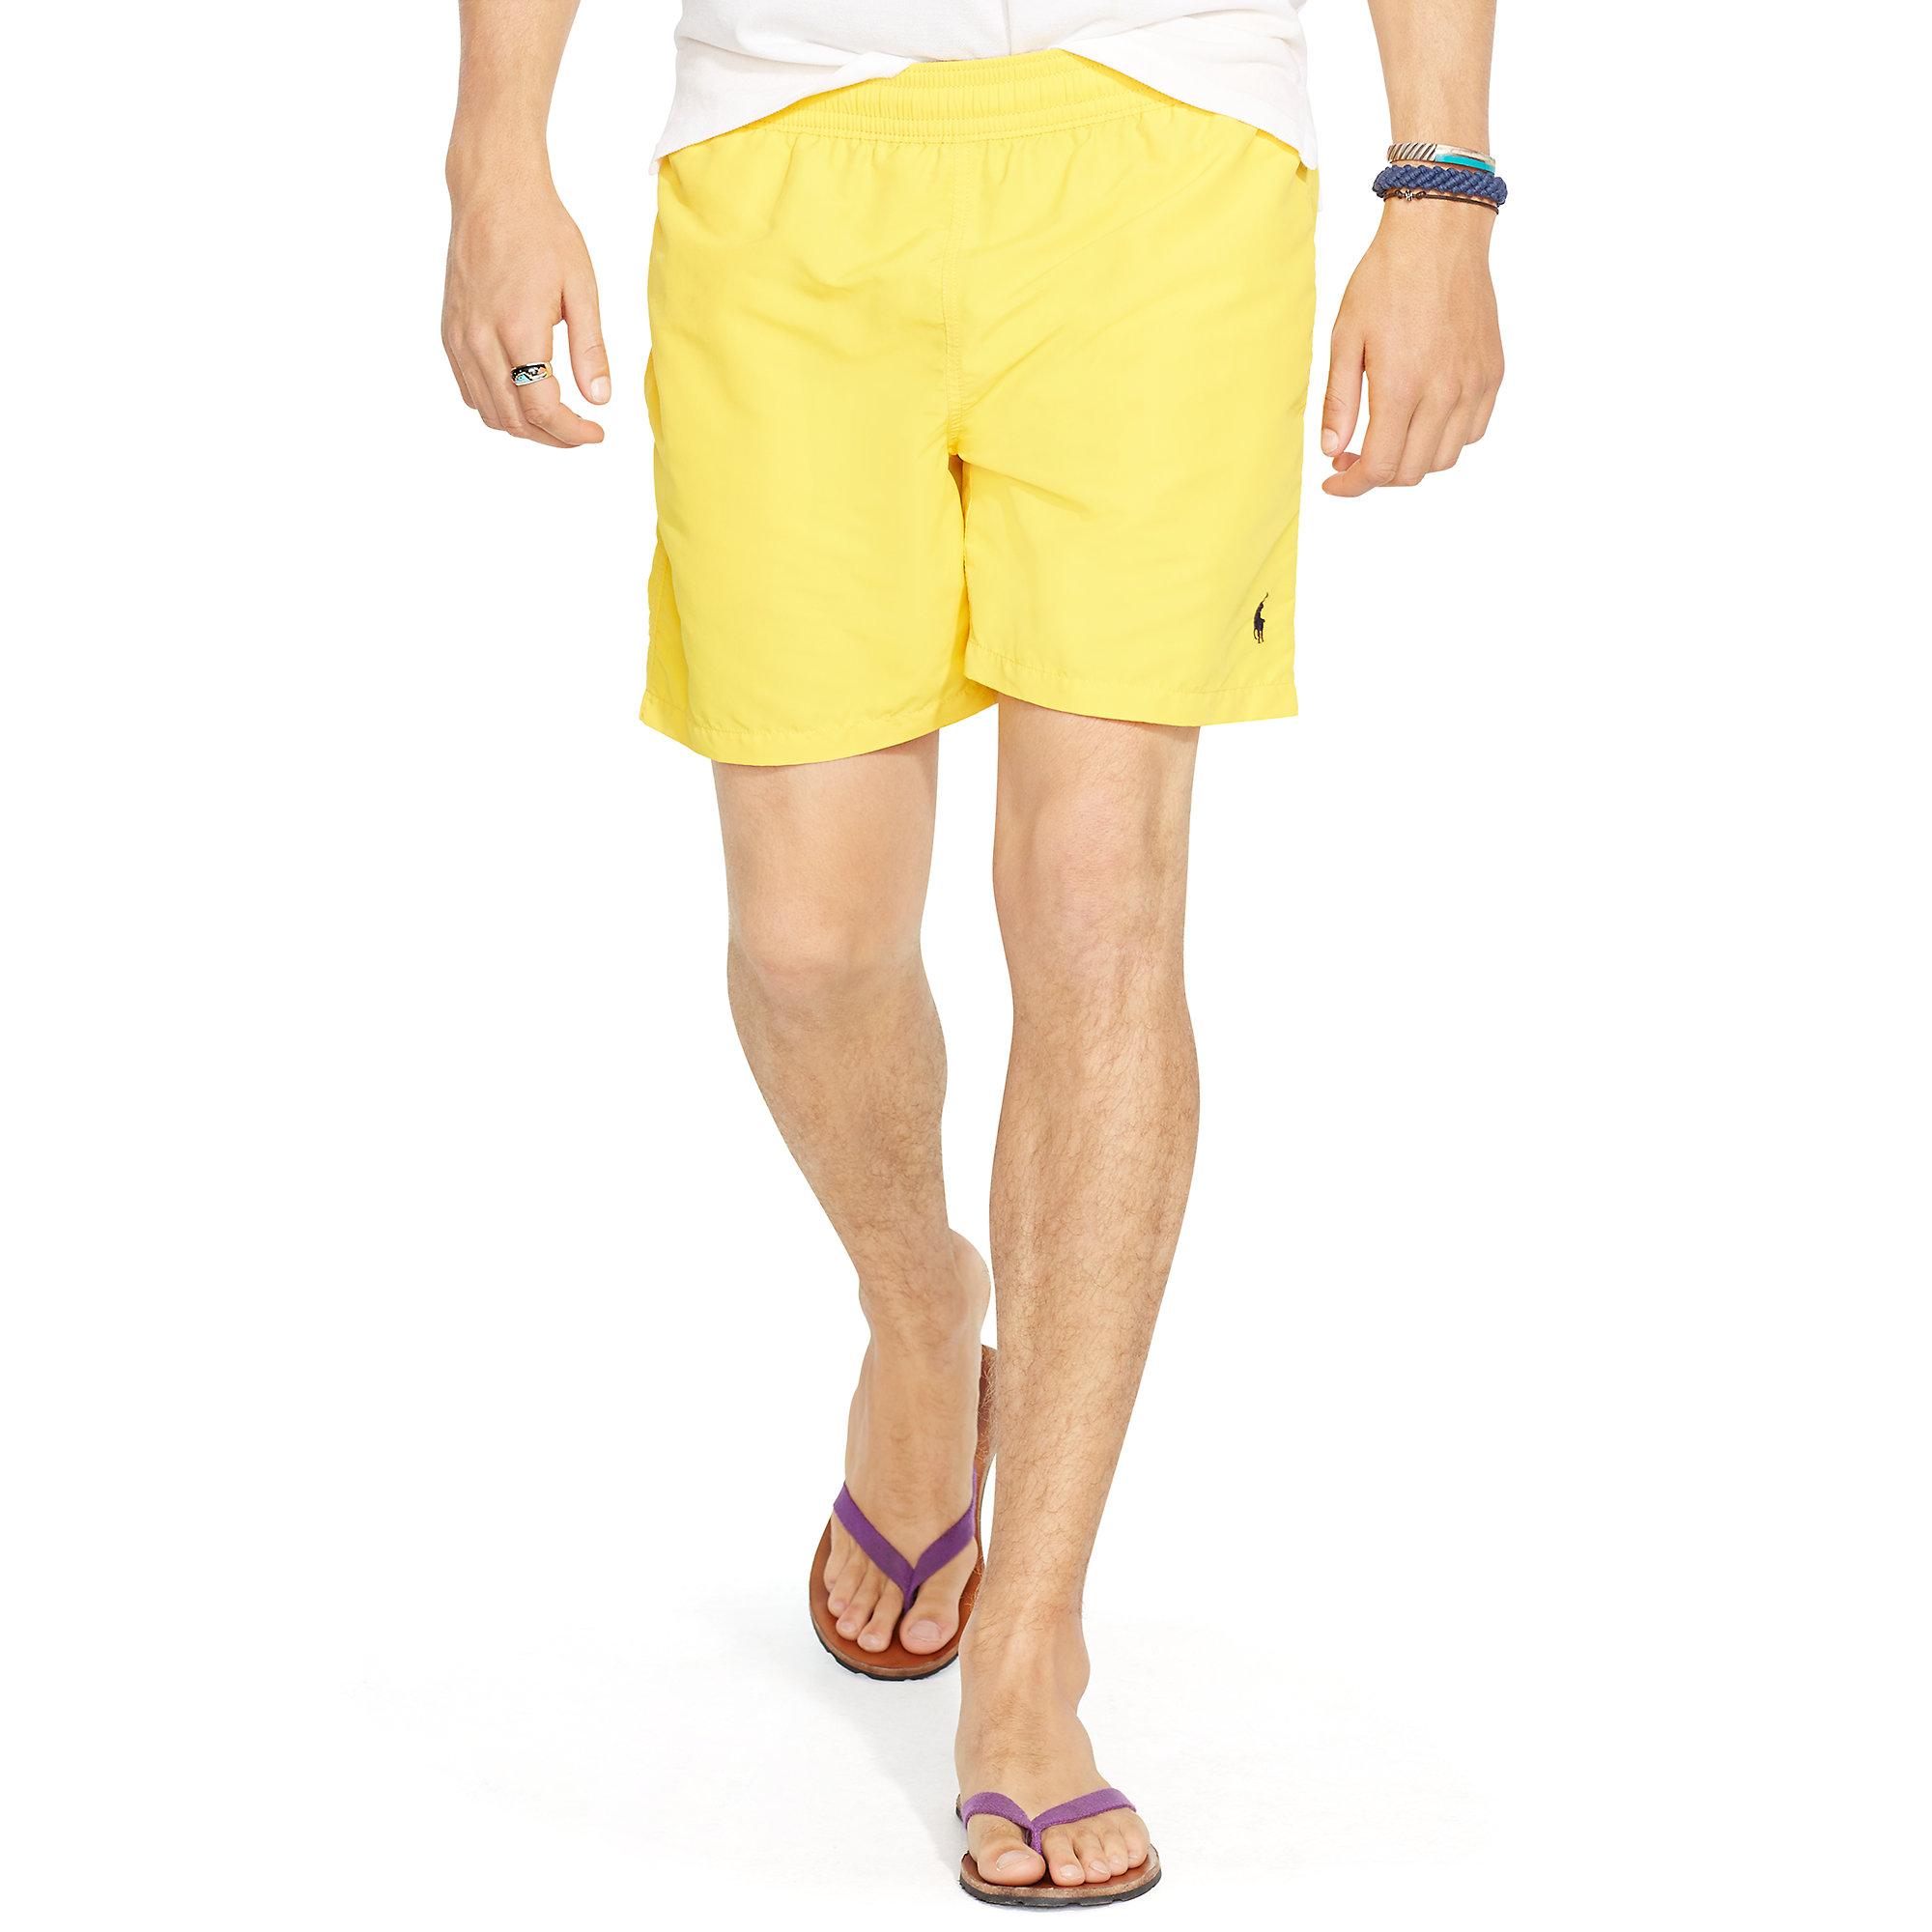 cd01151b6f6 ... wholesale lyst polo ralph lauren 6 solid hawaiian swim trunk in yellow  for men 9c773 48cf7